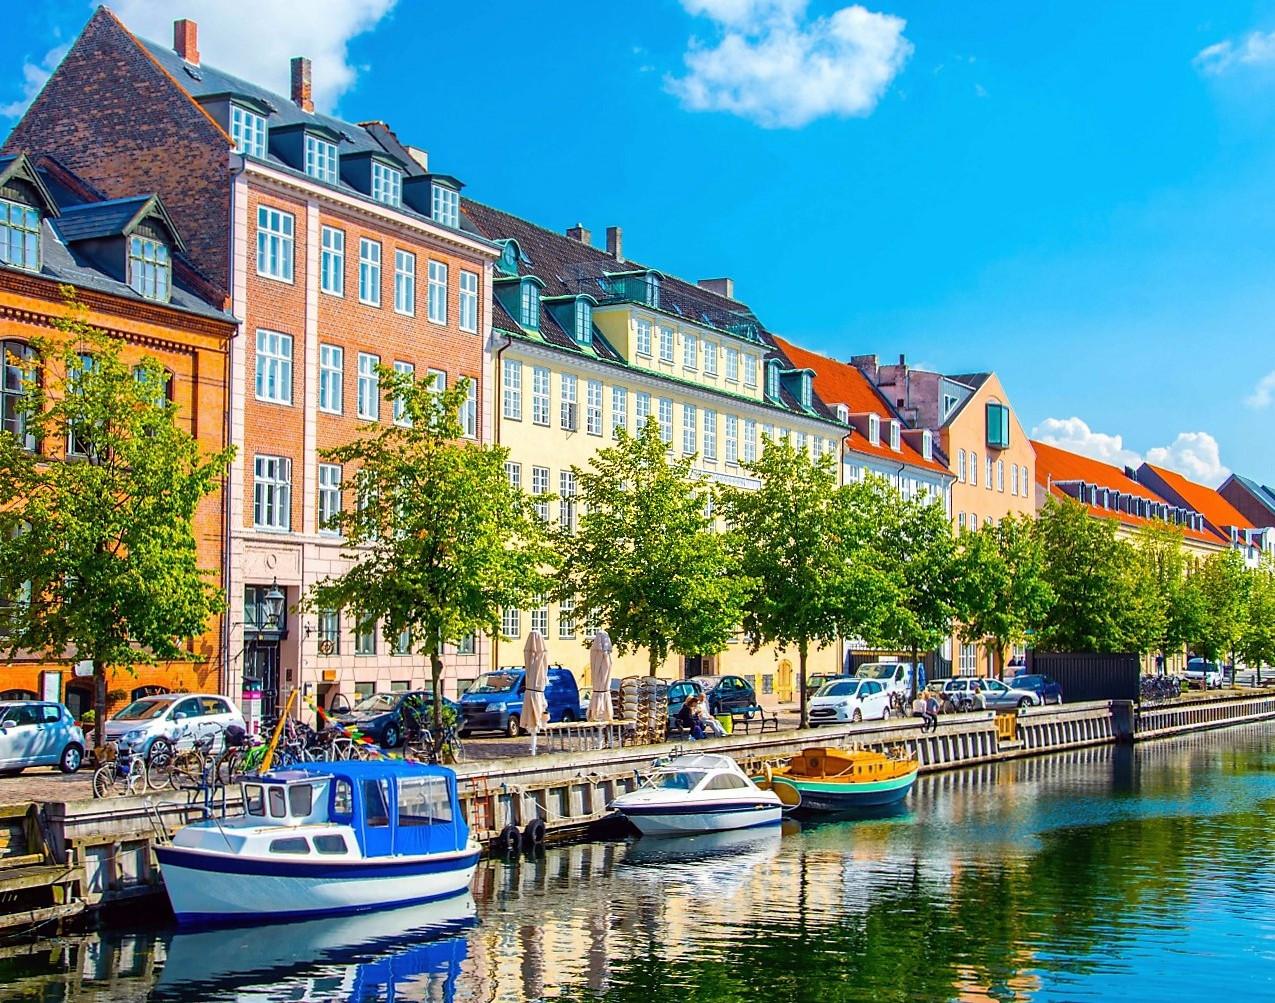 Danemark_Fotolia_93270222_Subscription_X